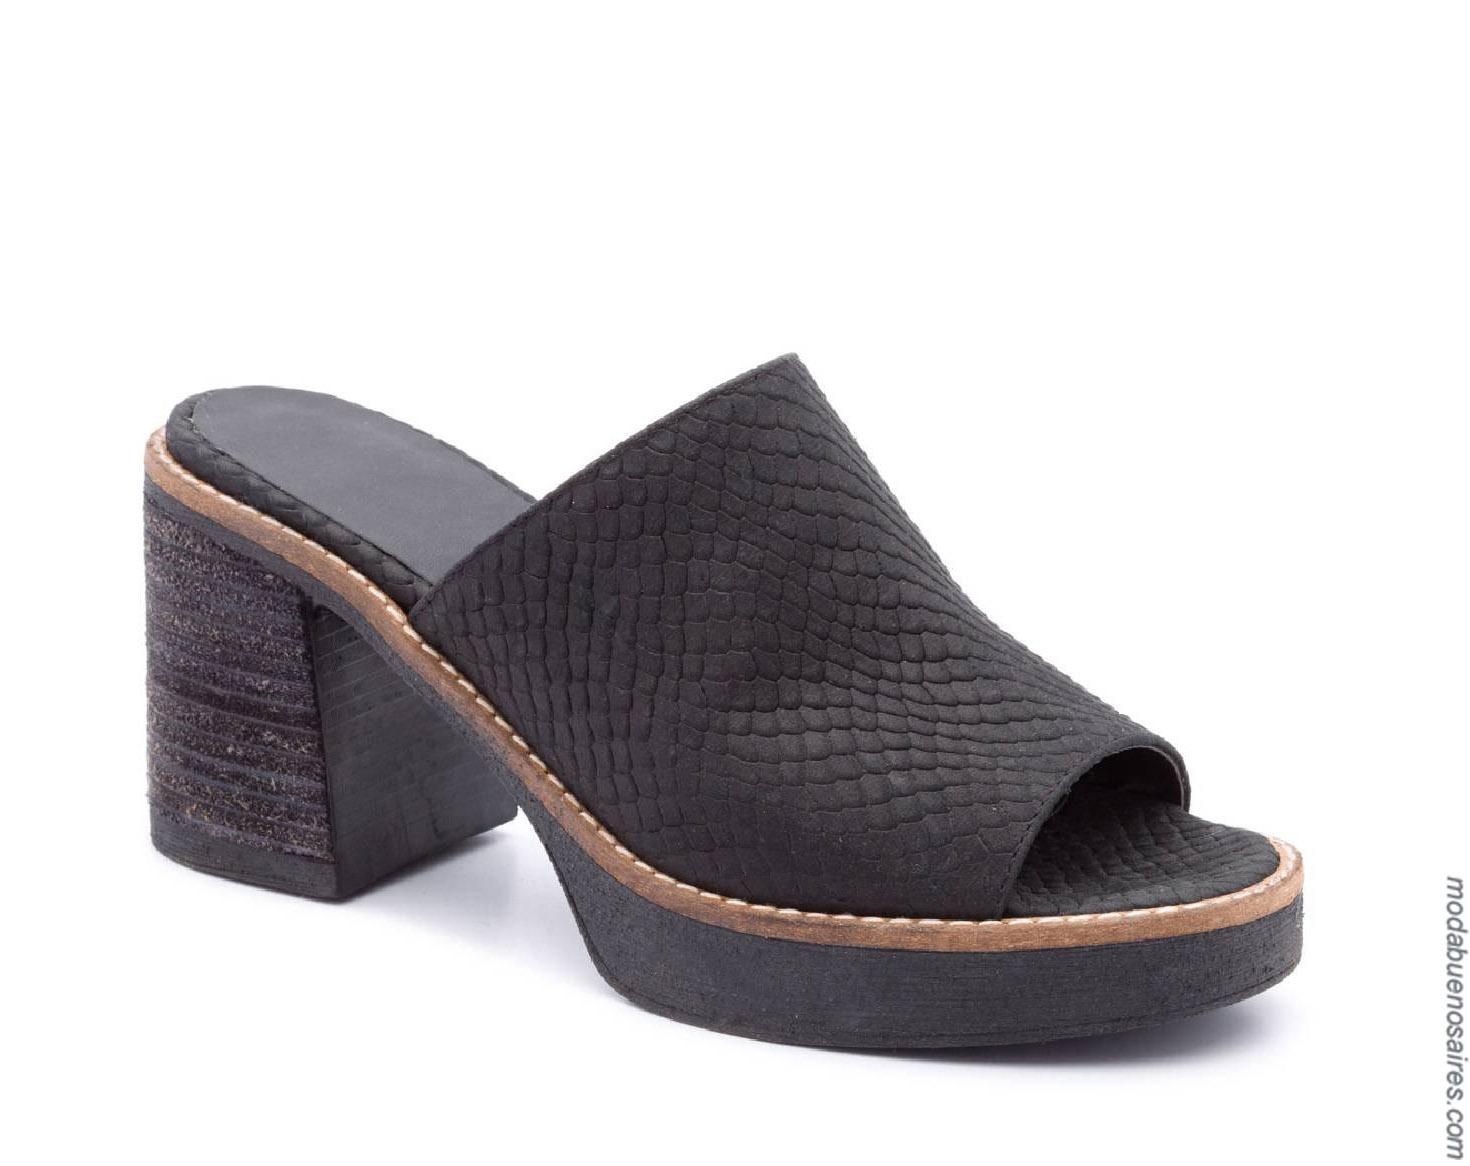 Sandalias primavera verano 2020. Moda primavera verano 2020 calzados.